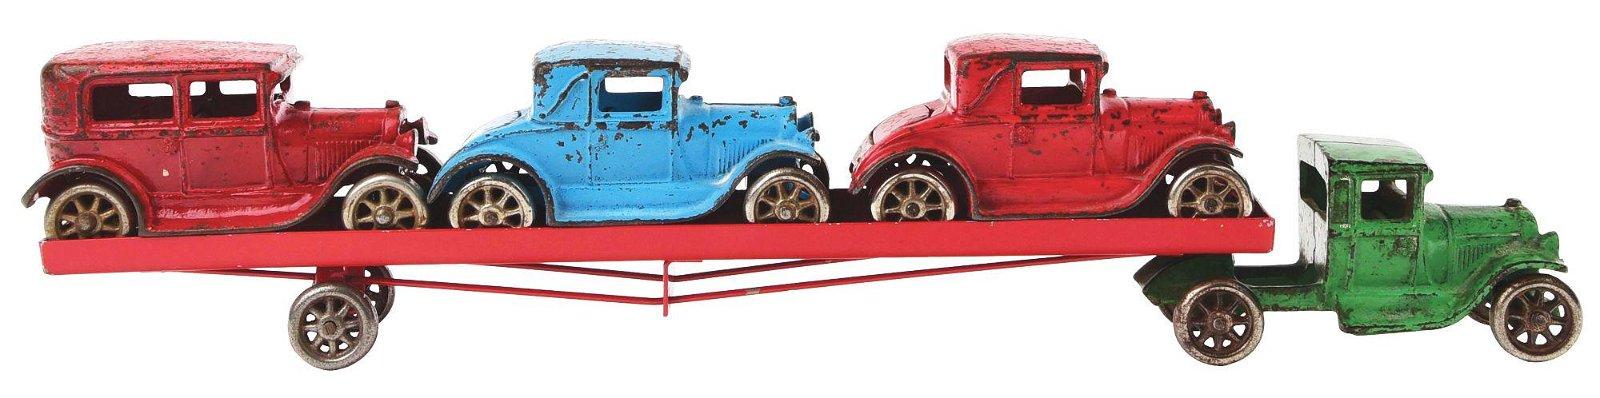 ARCADE CAR HAULER WITH THREE VEHICLES.